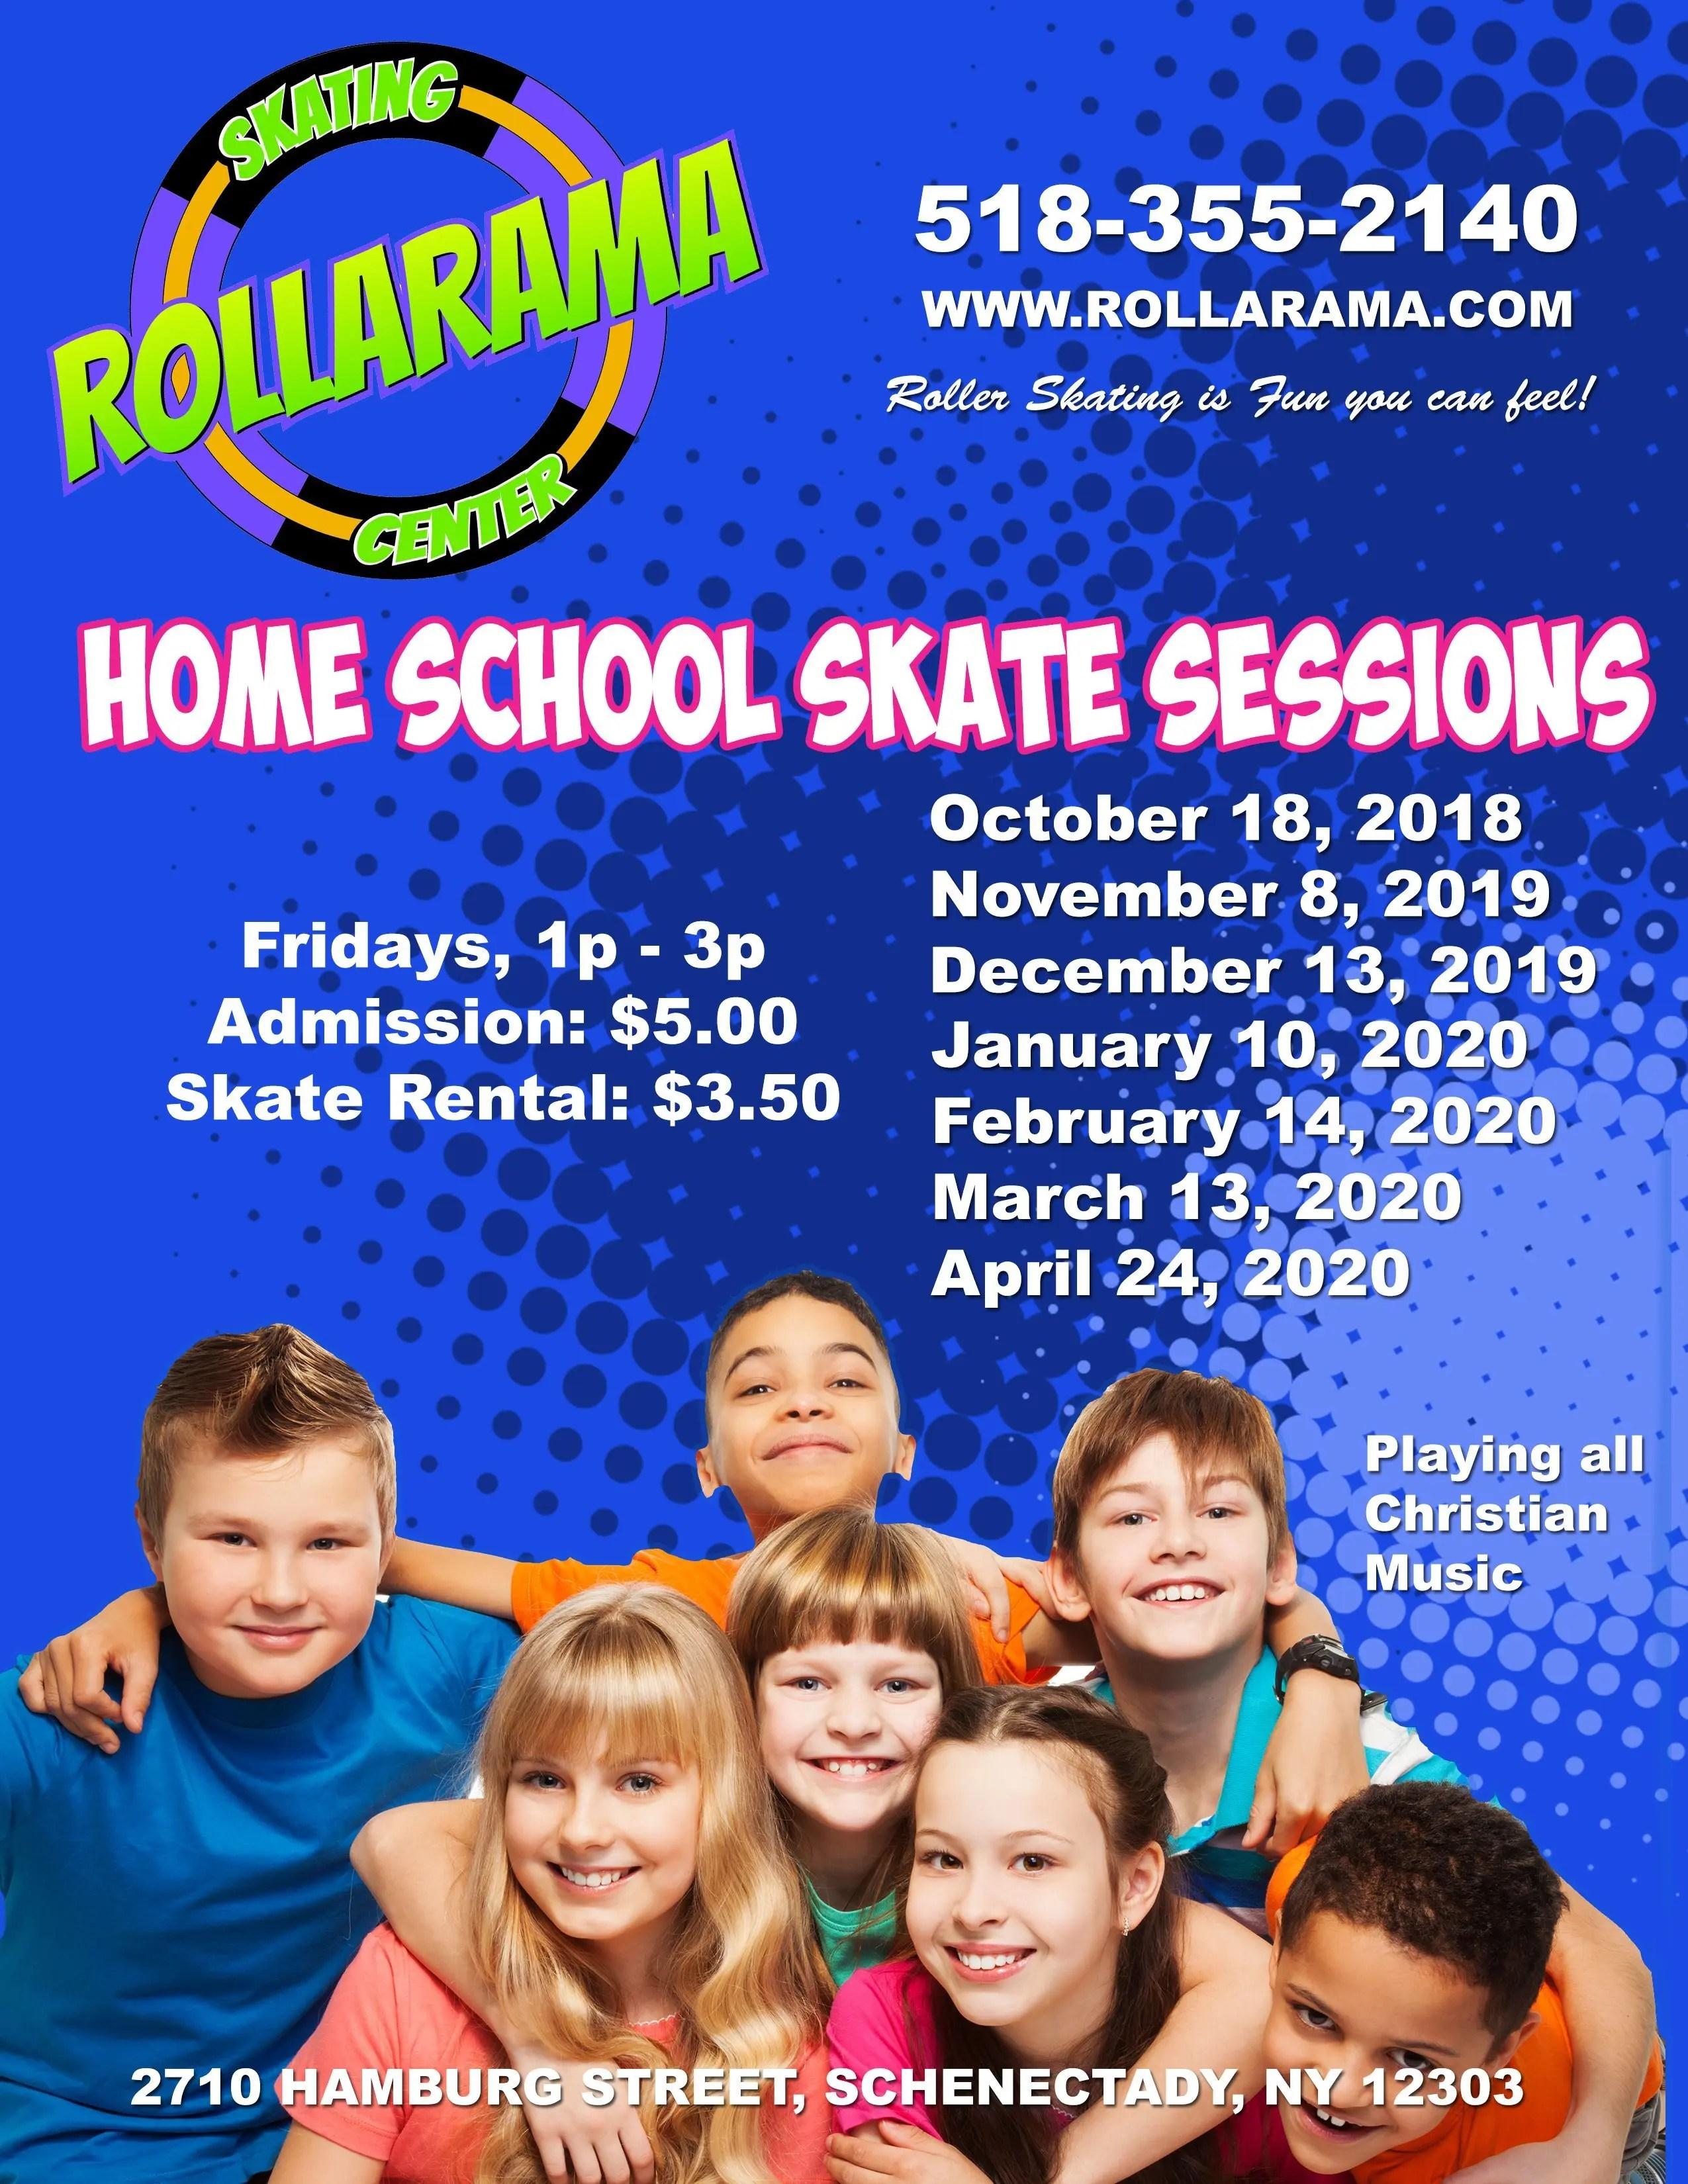 Home School Skate SEssion flyer